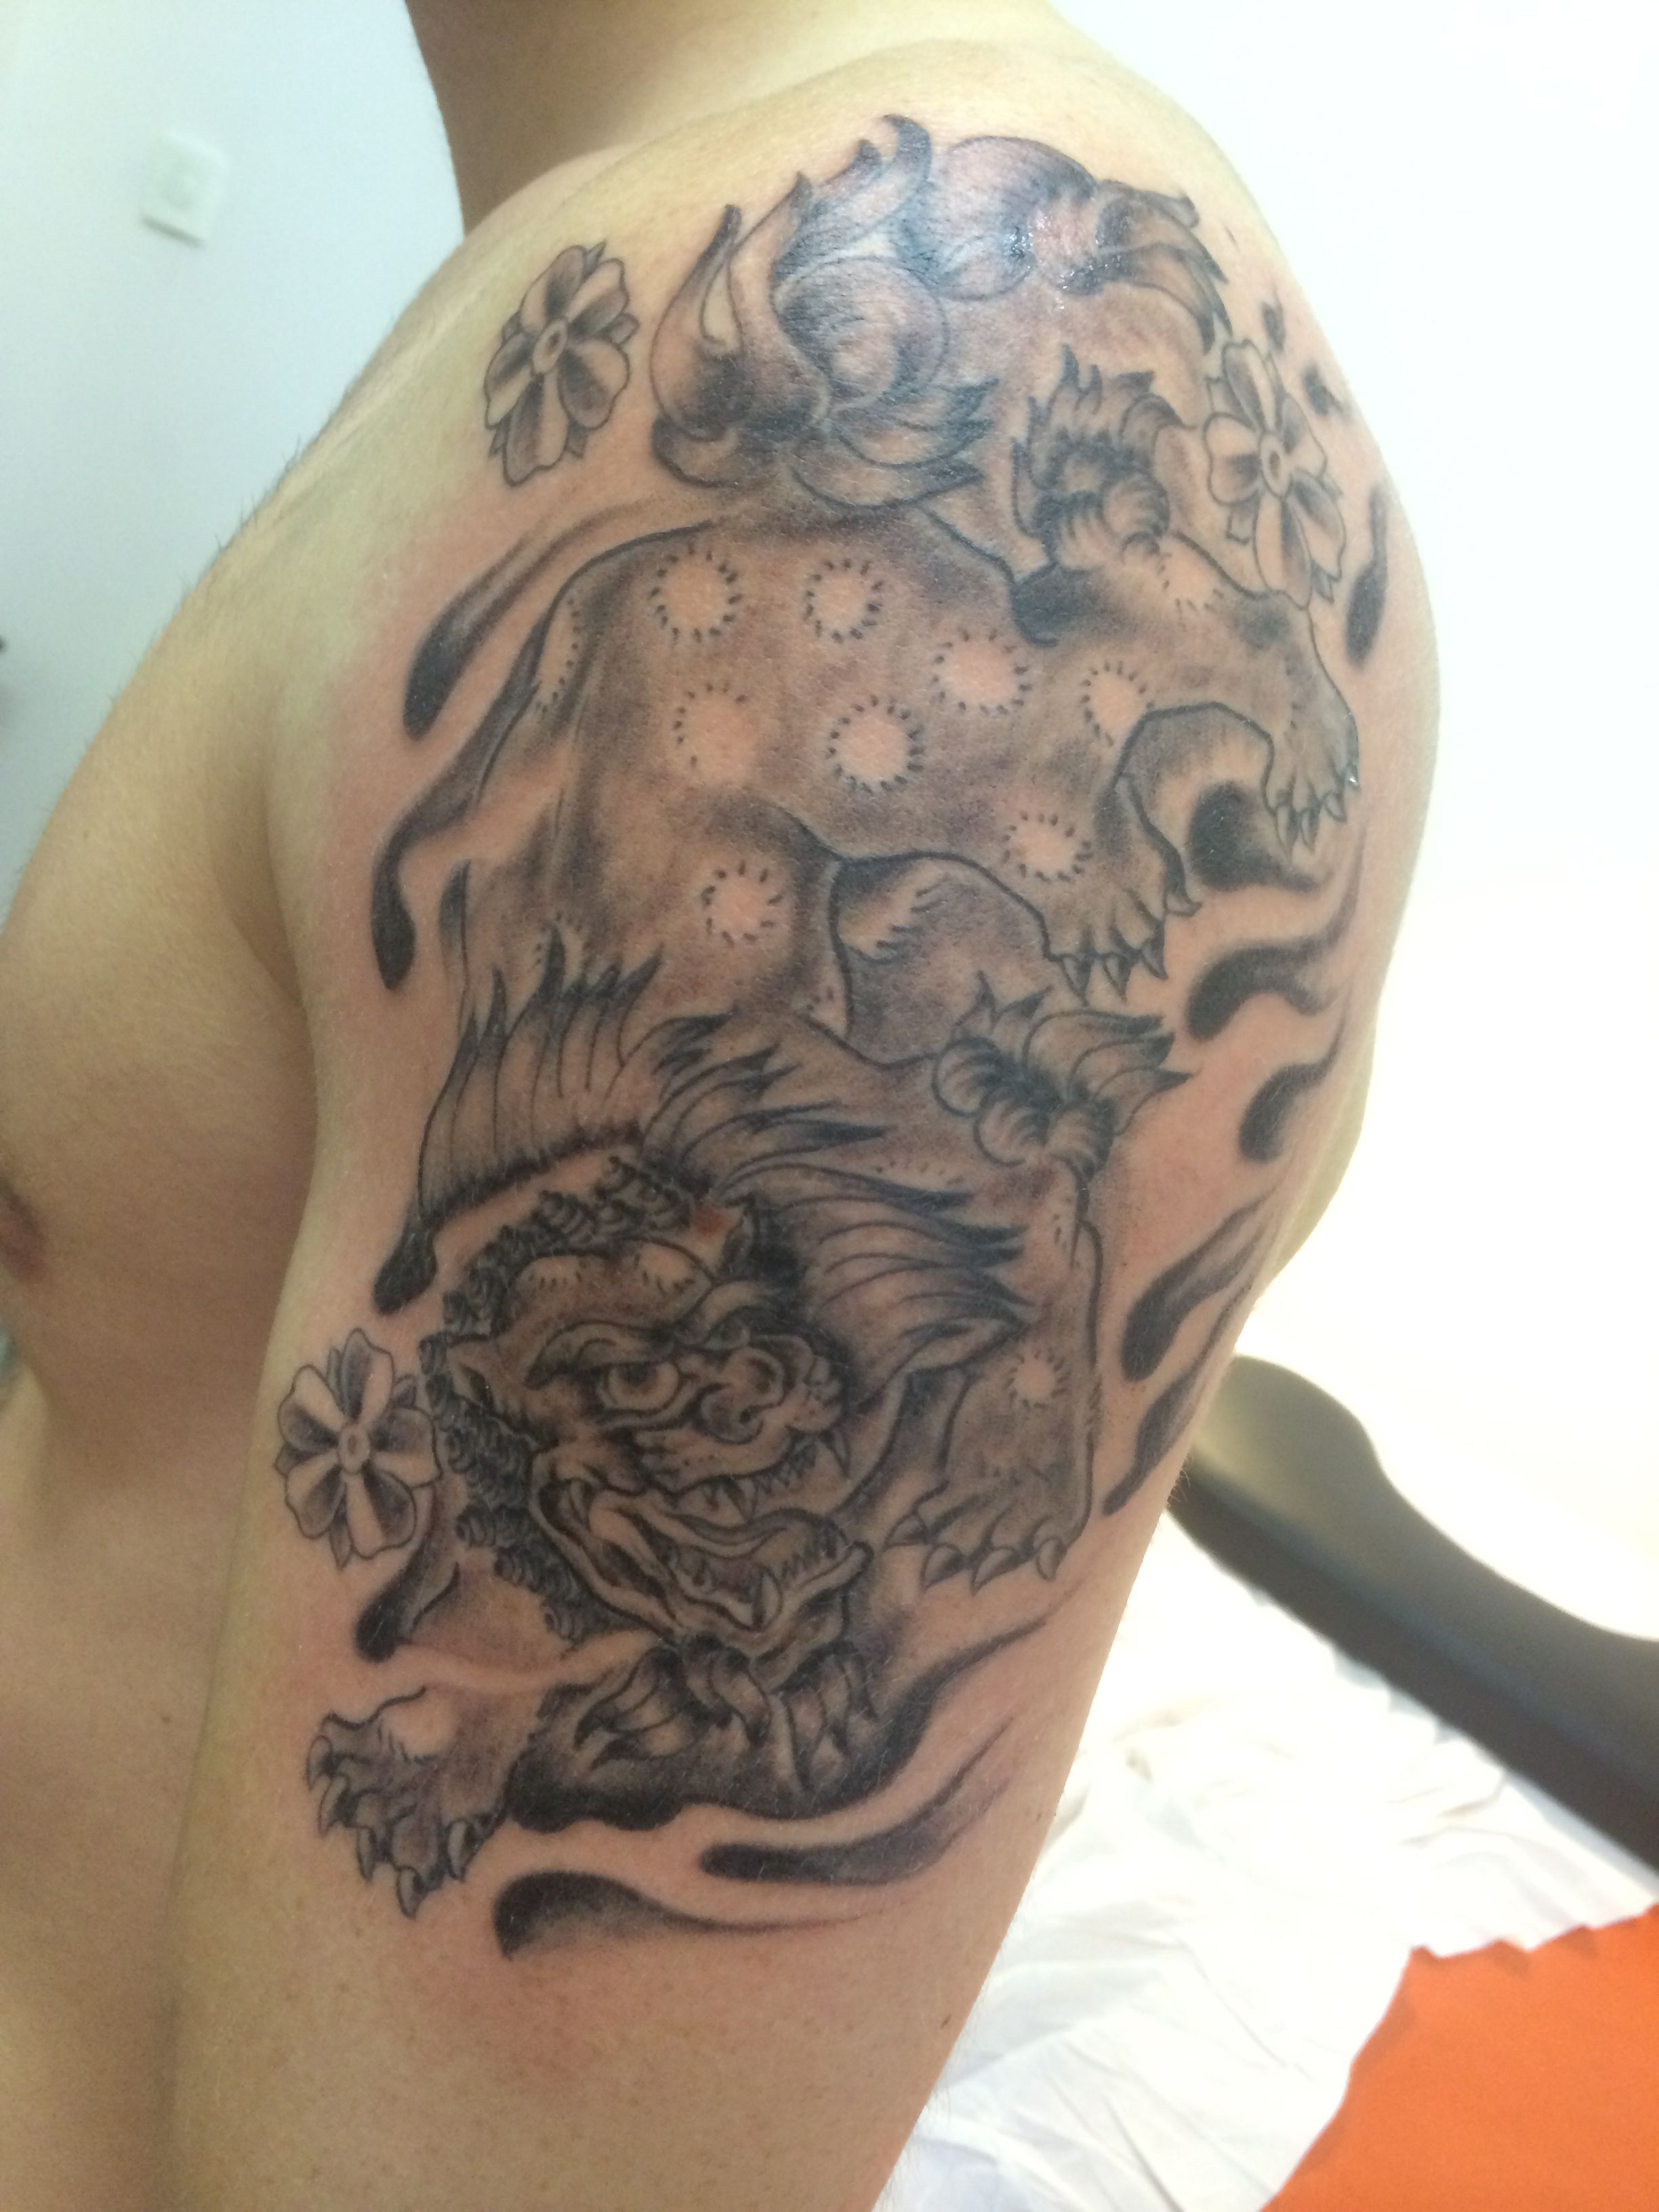 Foo dog tattoo addiction tattoo strasbourg pinterest for Tattoo addiction albany ga